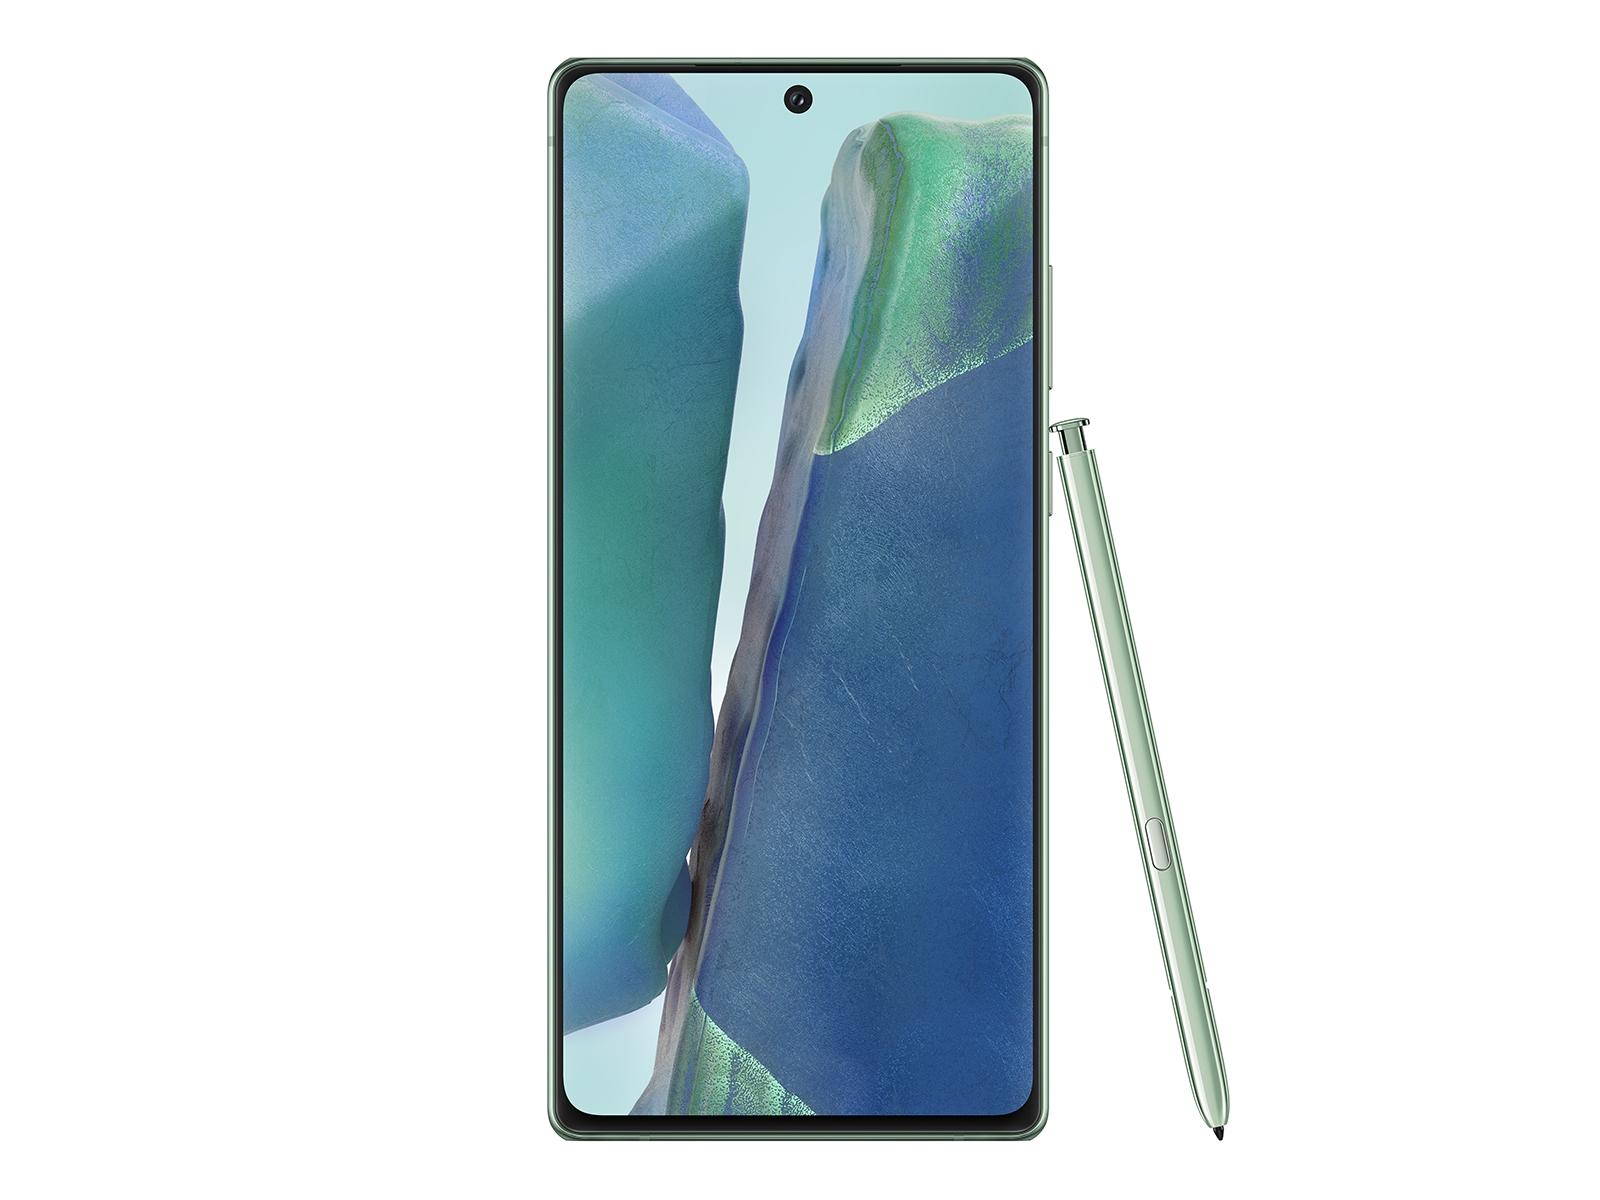 Thumbnail image of Galaxy Note20 5G 128GB (Sprint)